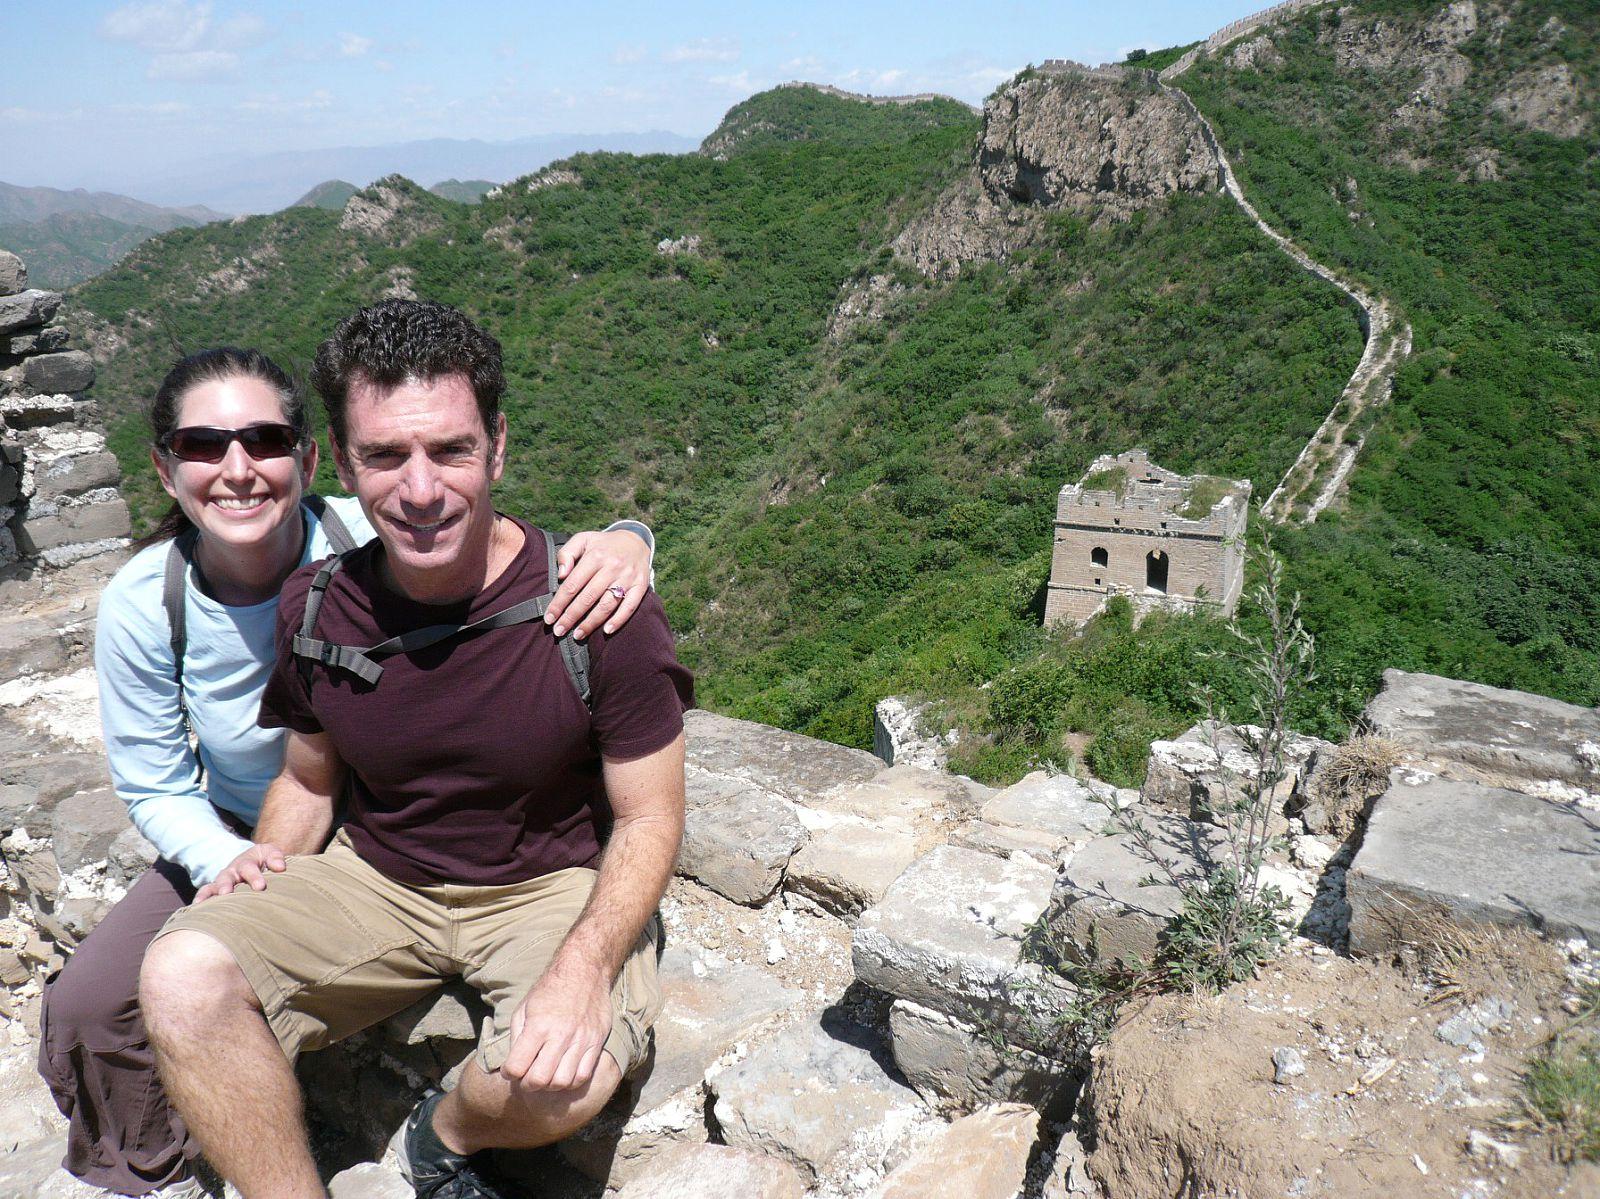 Lisa and George at the Great Wall of China.